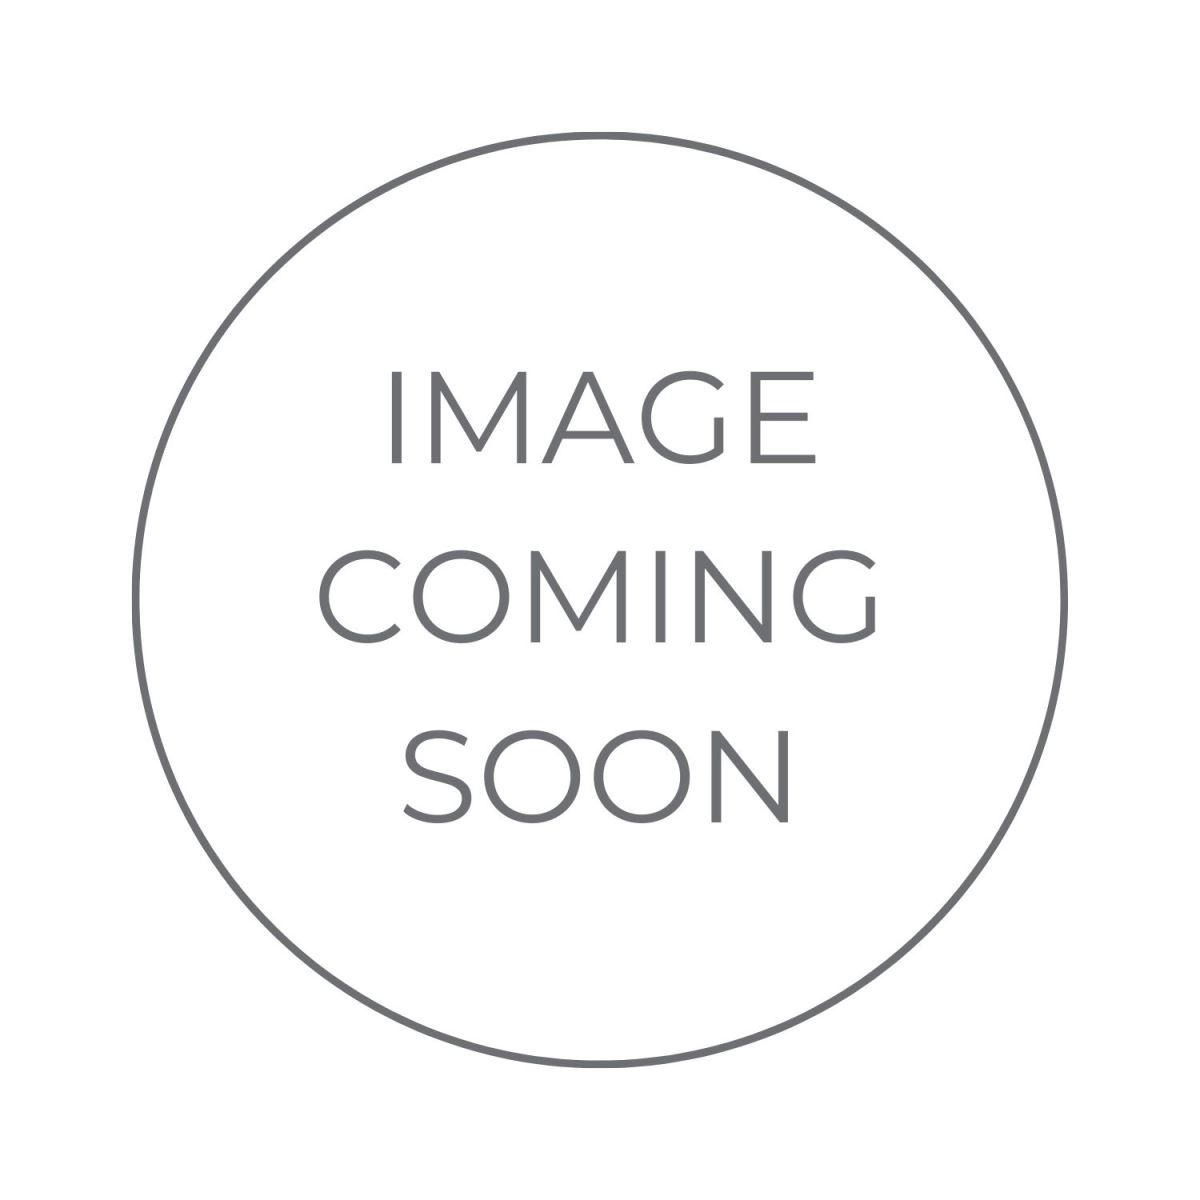 BRIEFS PER-FIT MED 96/CS